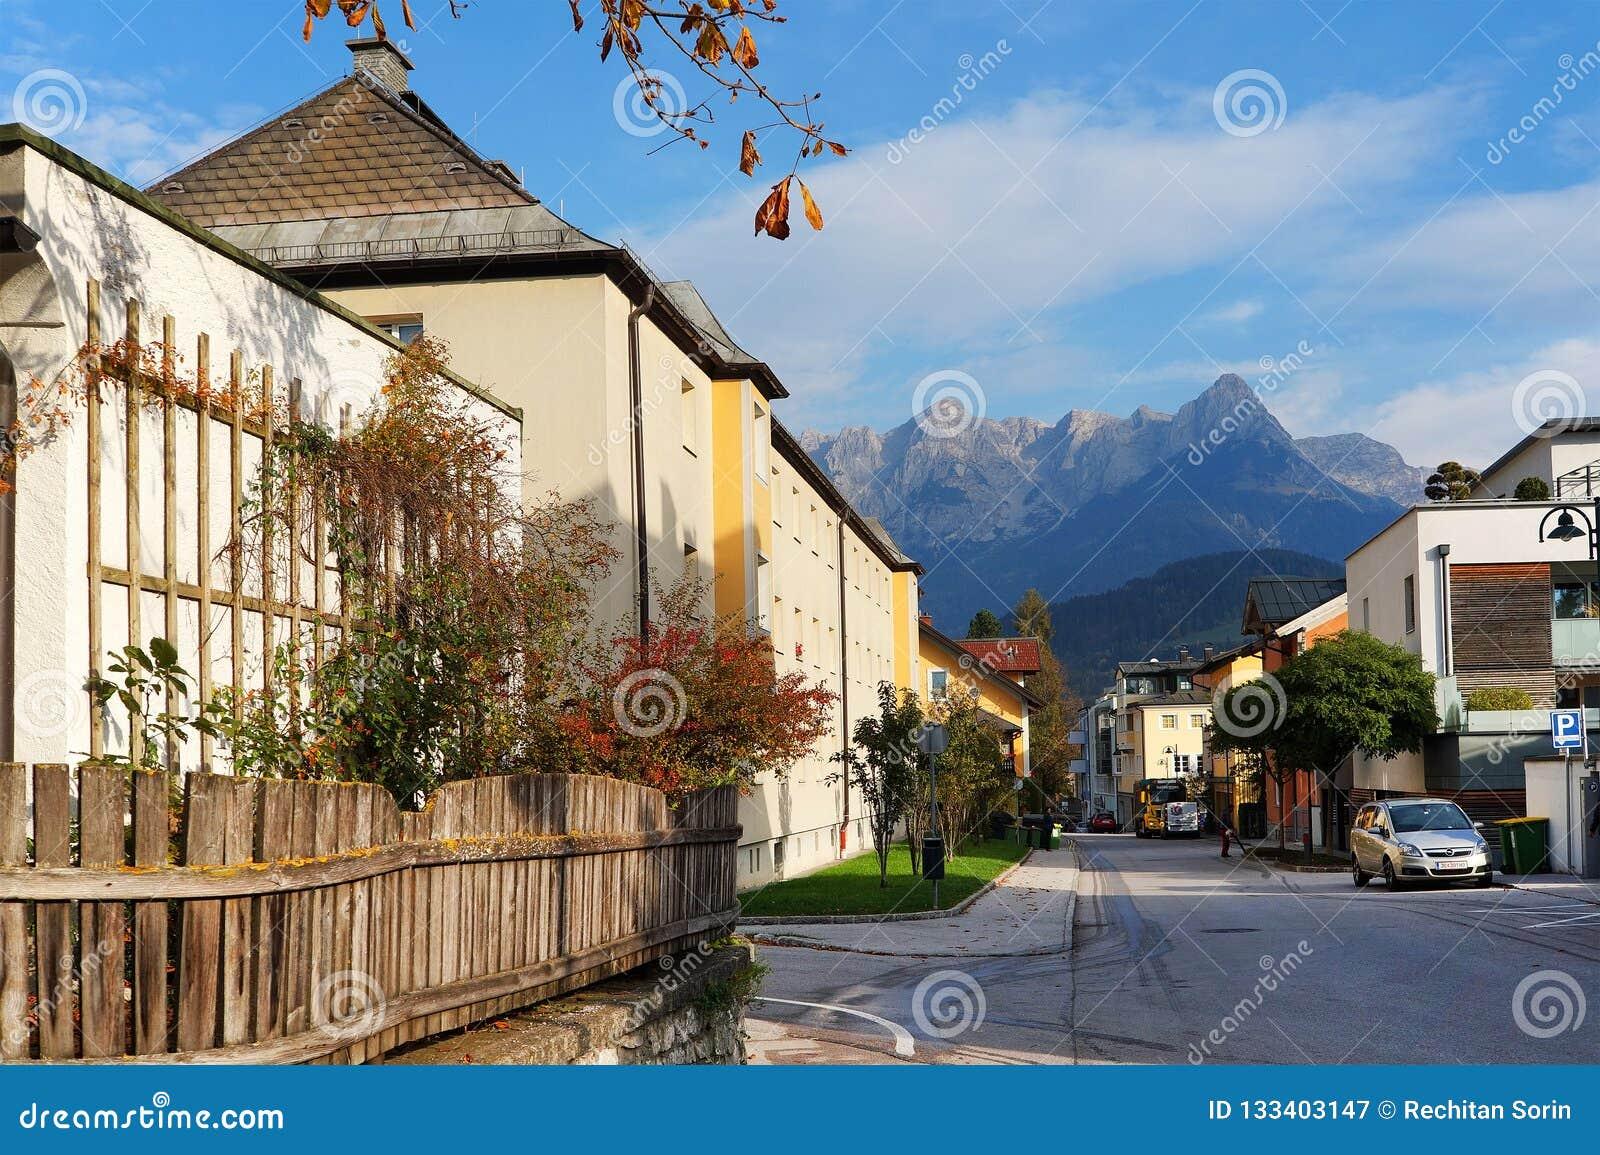 Arhitectural细节在比绍夫斯霍芬镇在一晴朗的秋天天 Hochkonig山在背景中